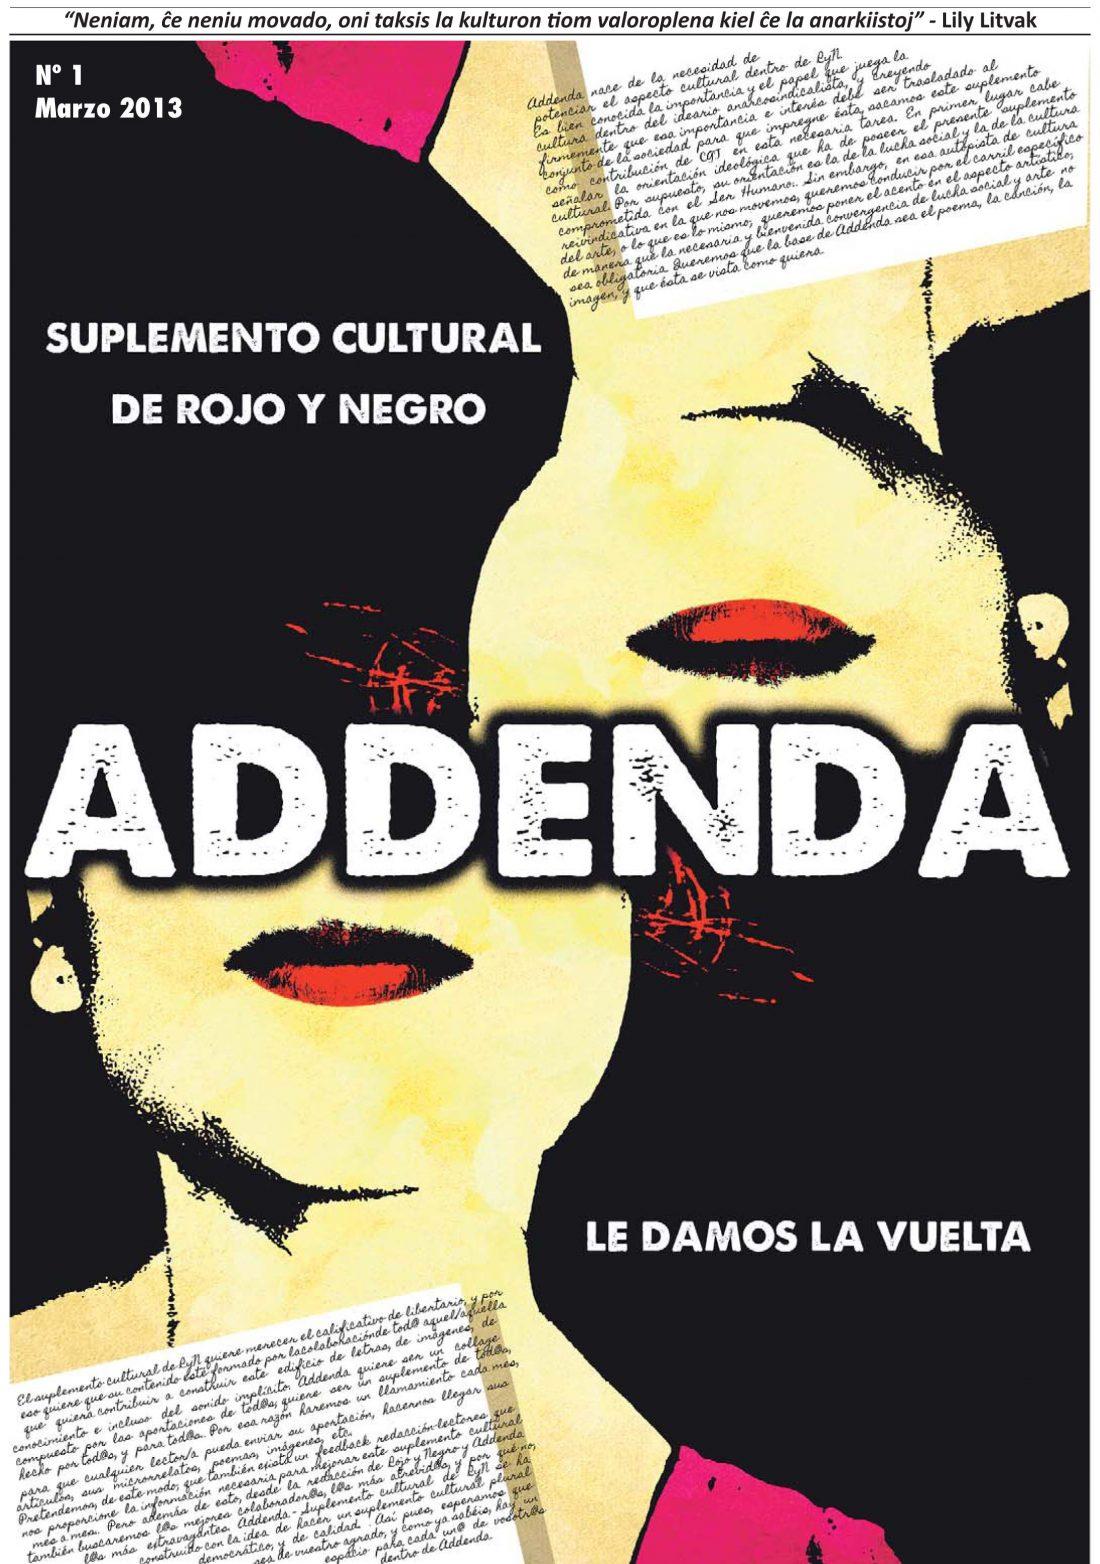 Addenda, suplemento cultural del RyN – Nº 1, marzo 2013